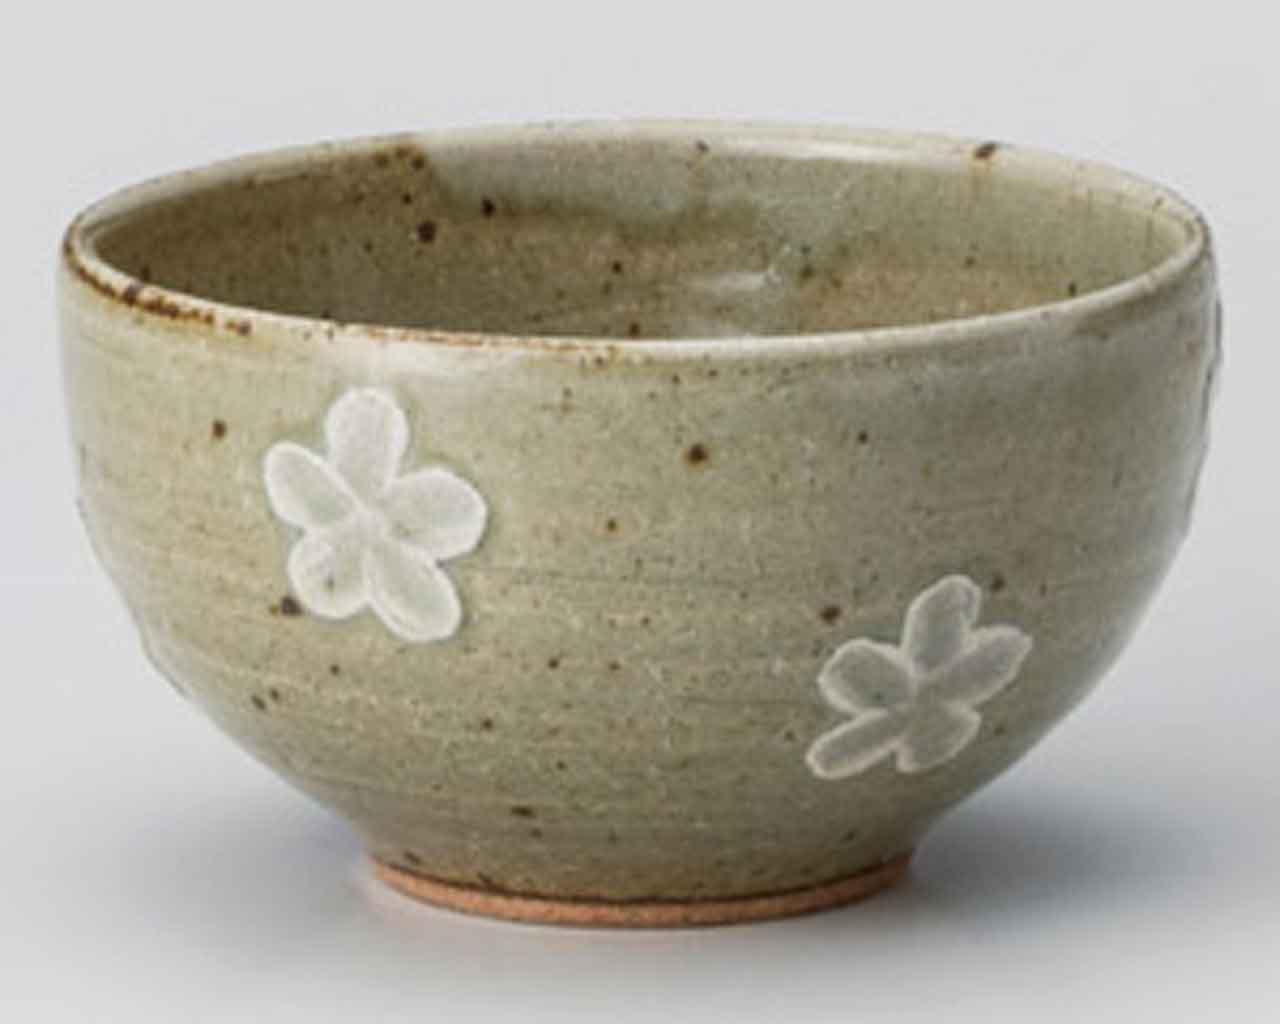 Kahori 5.1inch Set of 10 Rice bowls Ceramic Made in Japan